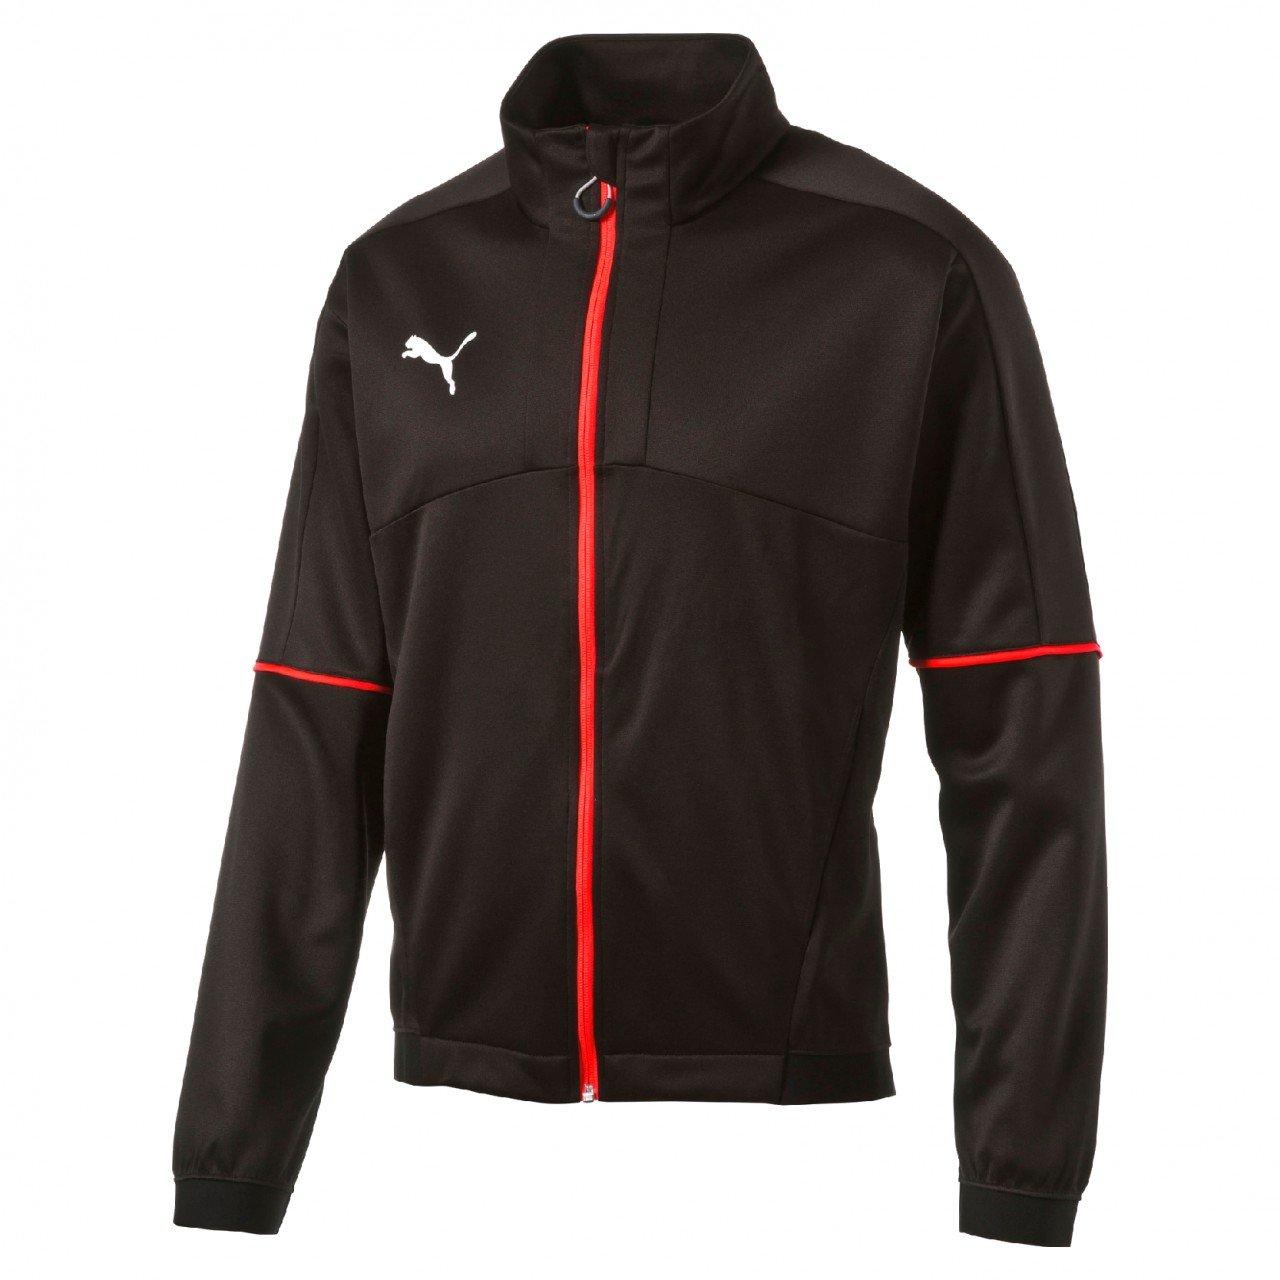 Puma Herren It Evotrg Track Jacket Jacke